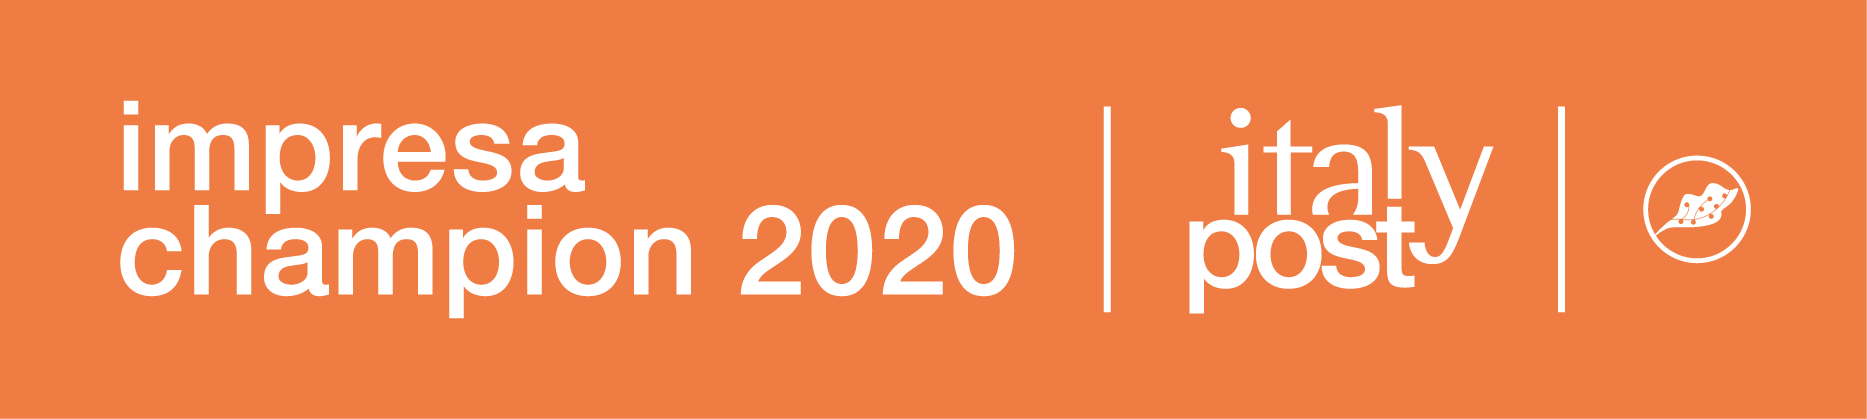 SIIT Migliore Impresa 2020